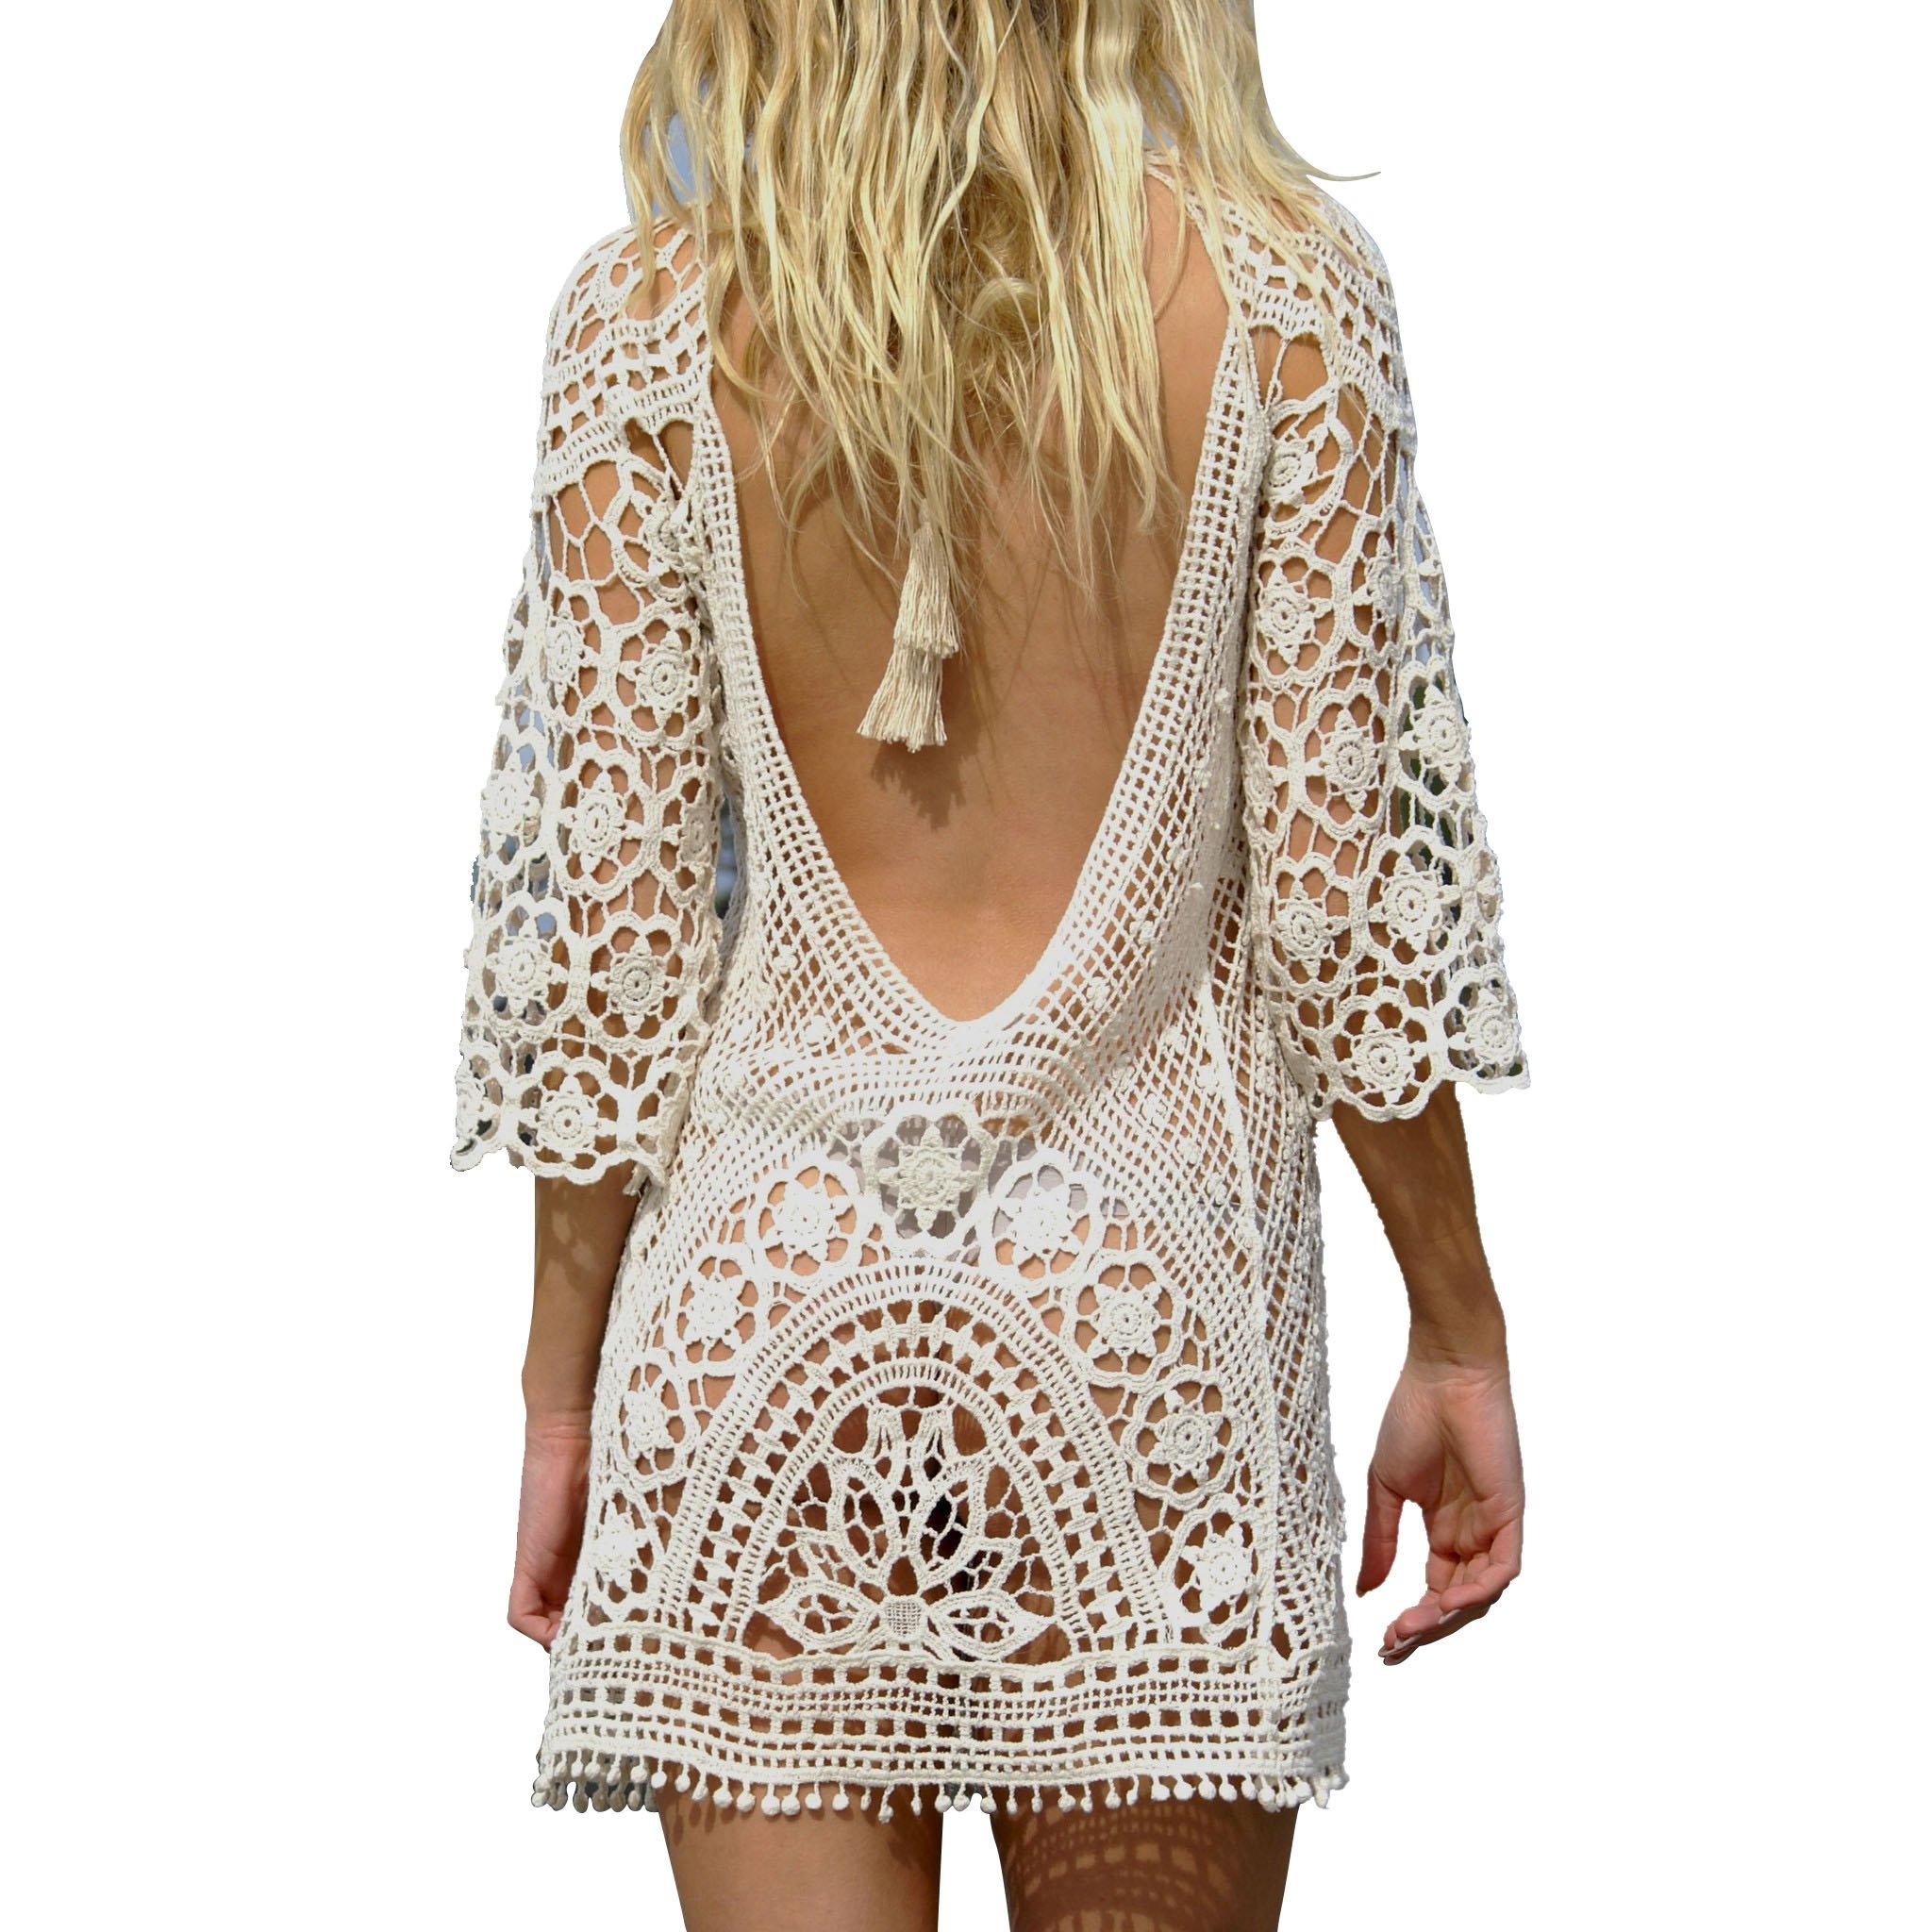 Jeasona Women's Bathing Suit Cover up Crochet Lace Bikini Swimsuit Dress (White, M)